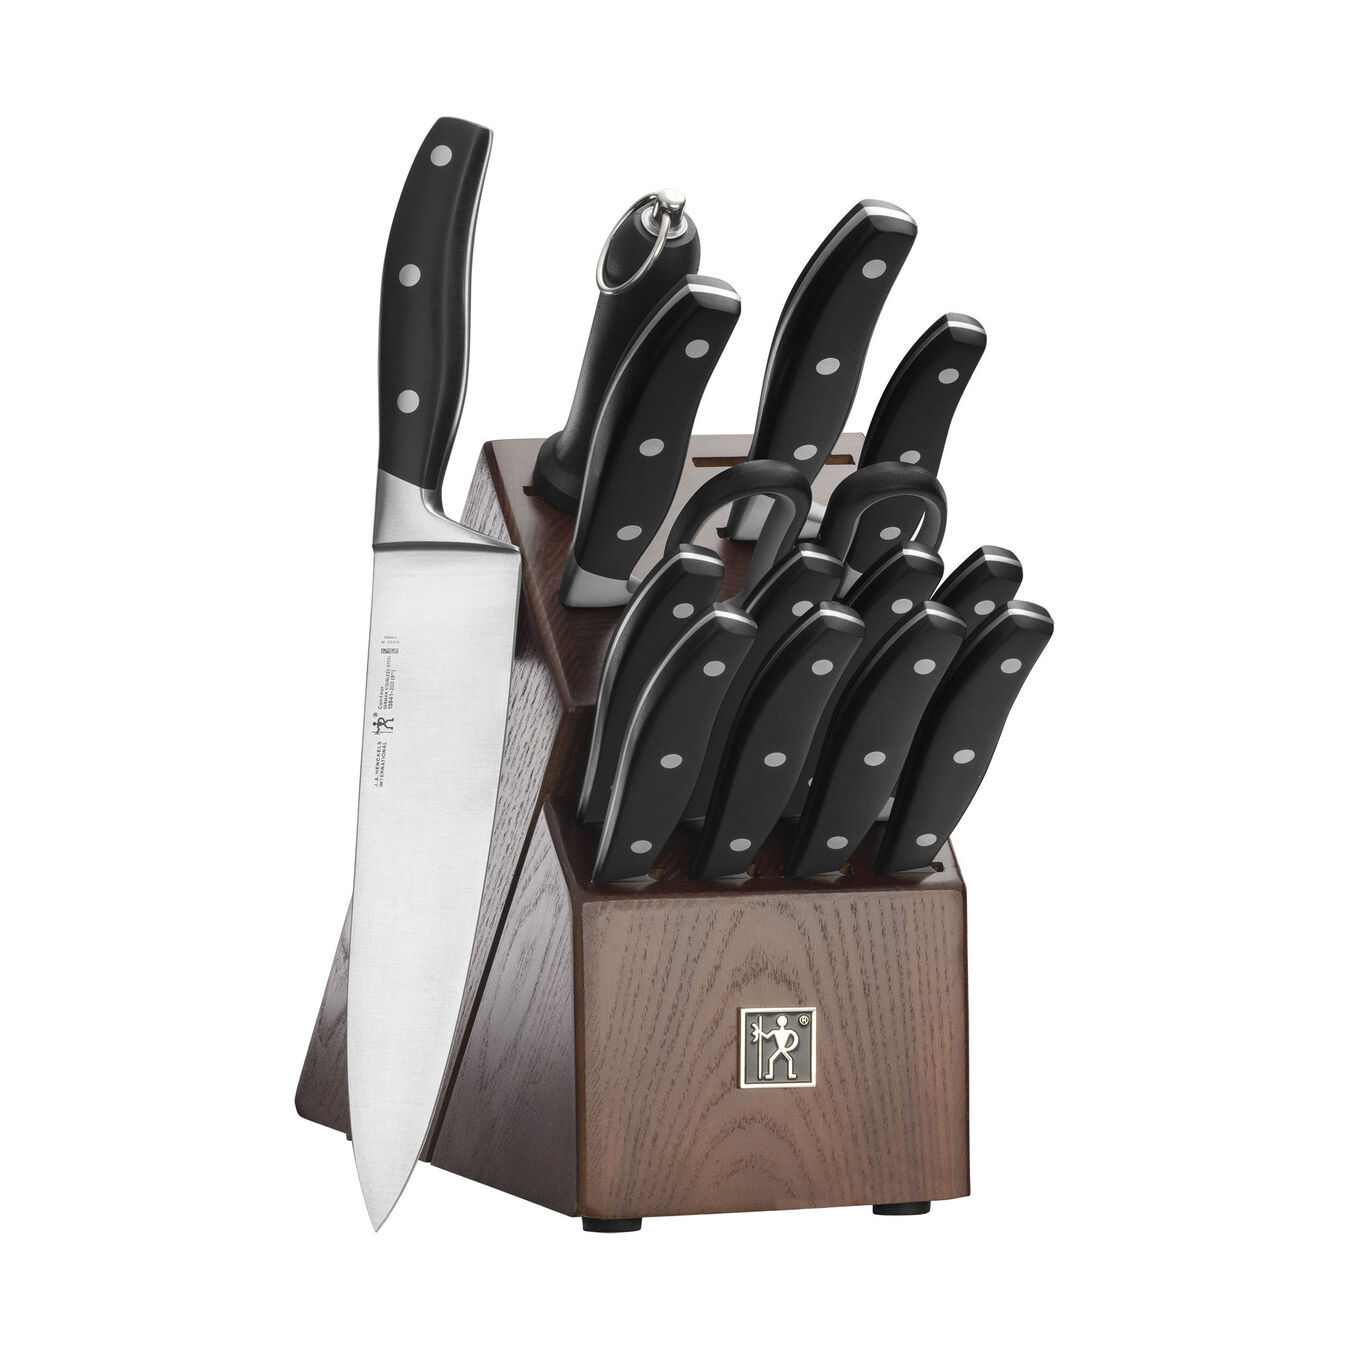 Knife block set, Black Matte,,large 1